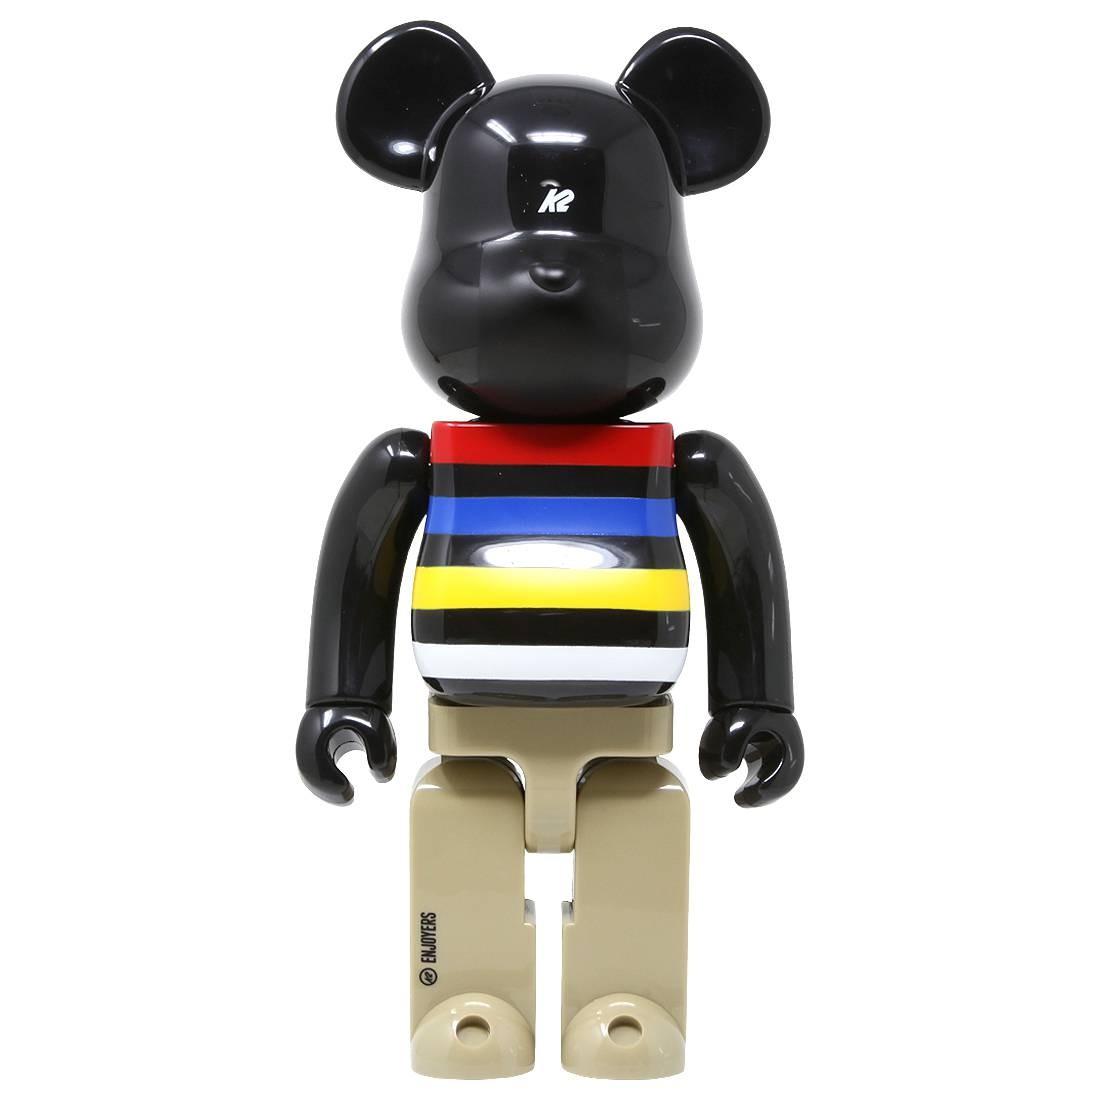 Medicom K2 Sports 400% Bearbrick Figure (black)